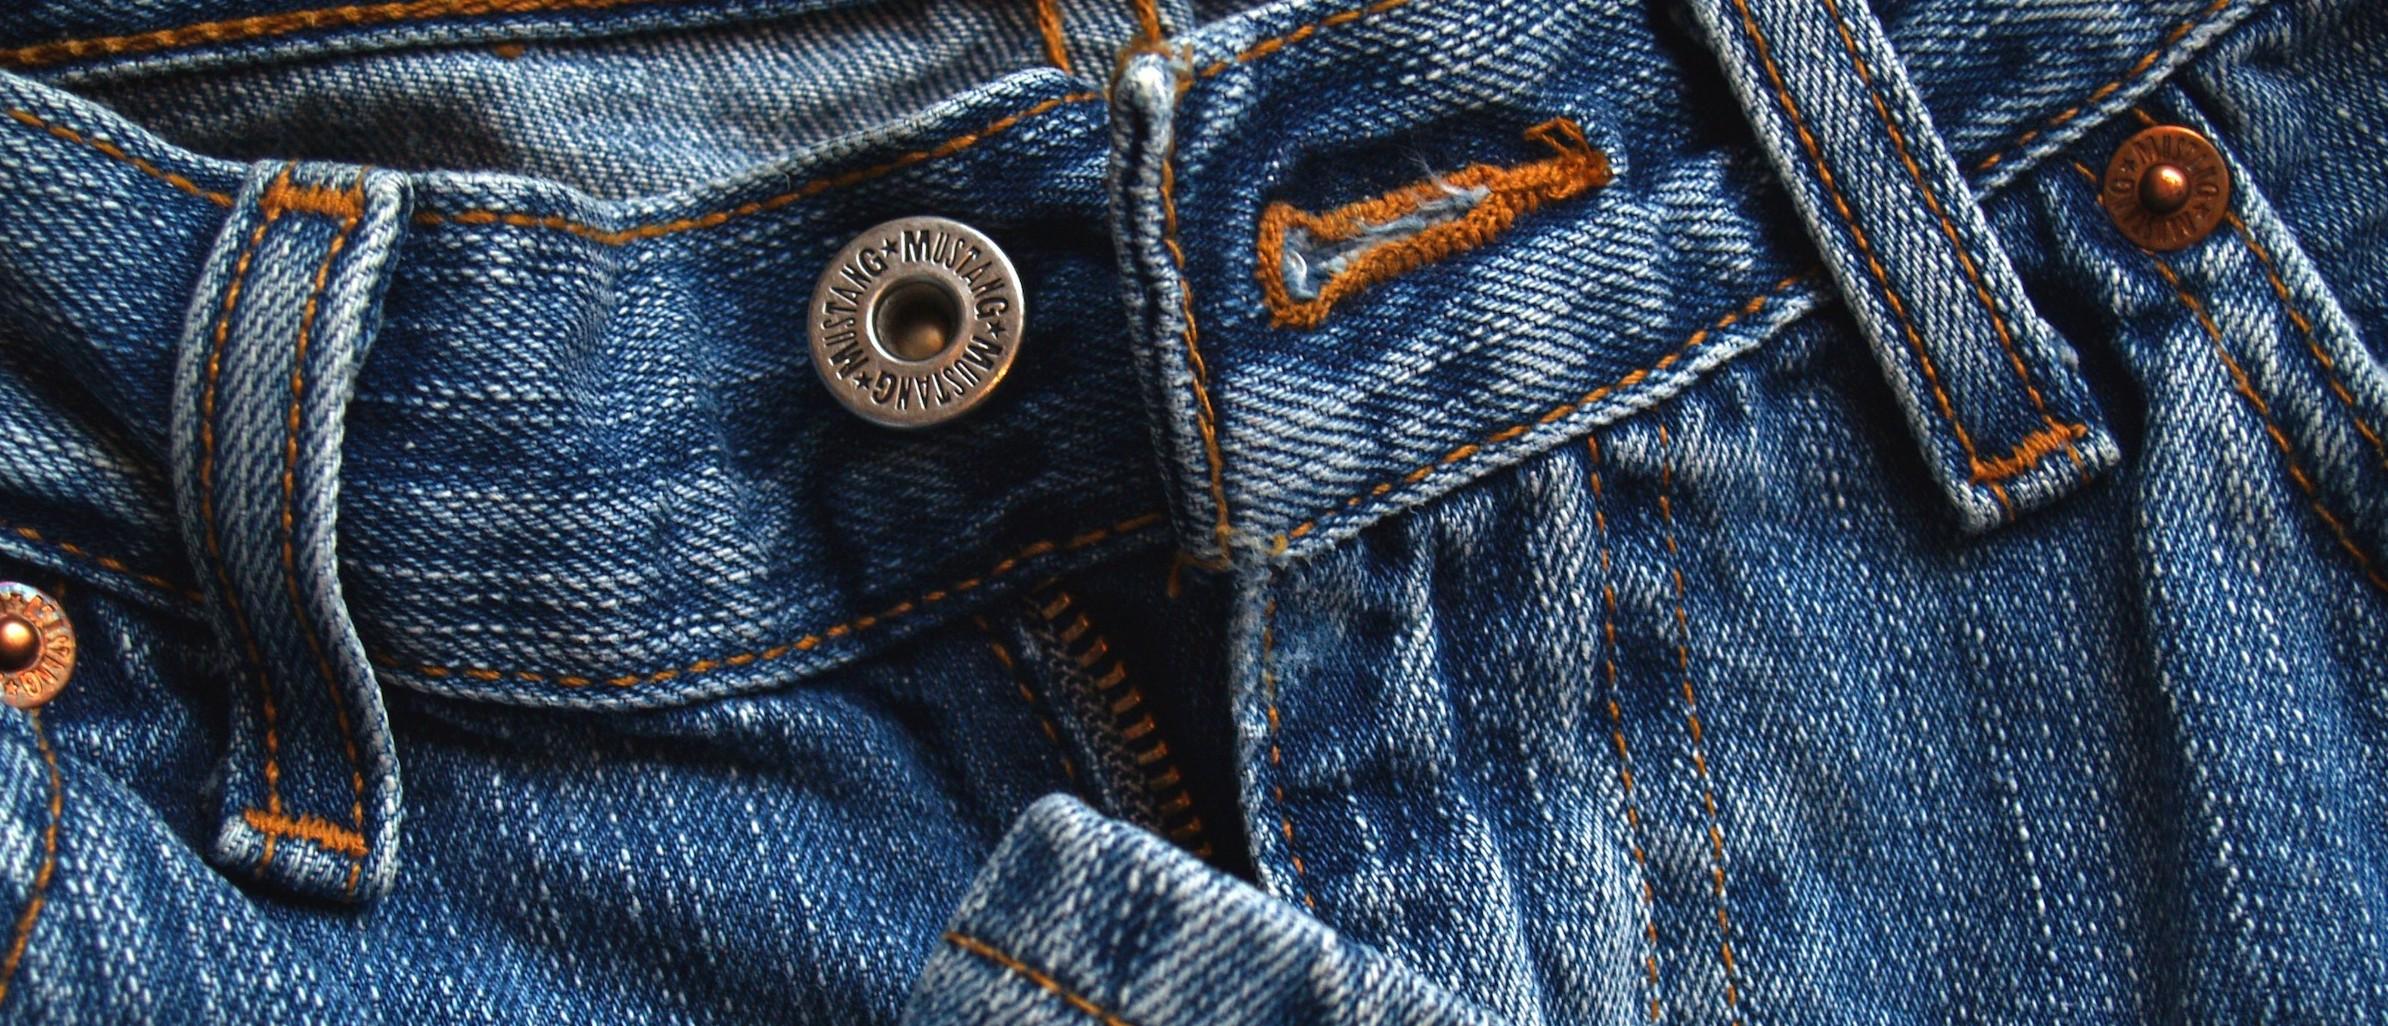 Ательє Реглан - Пошиття одягу на замовлення 48aa4fb11d72d